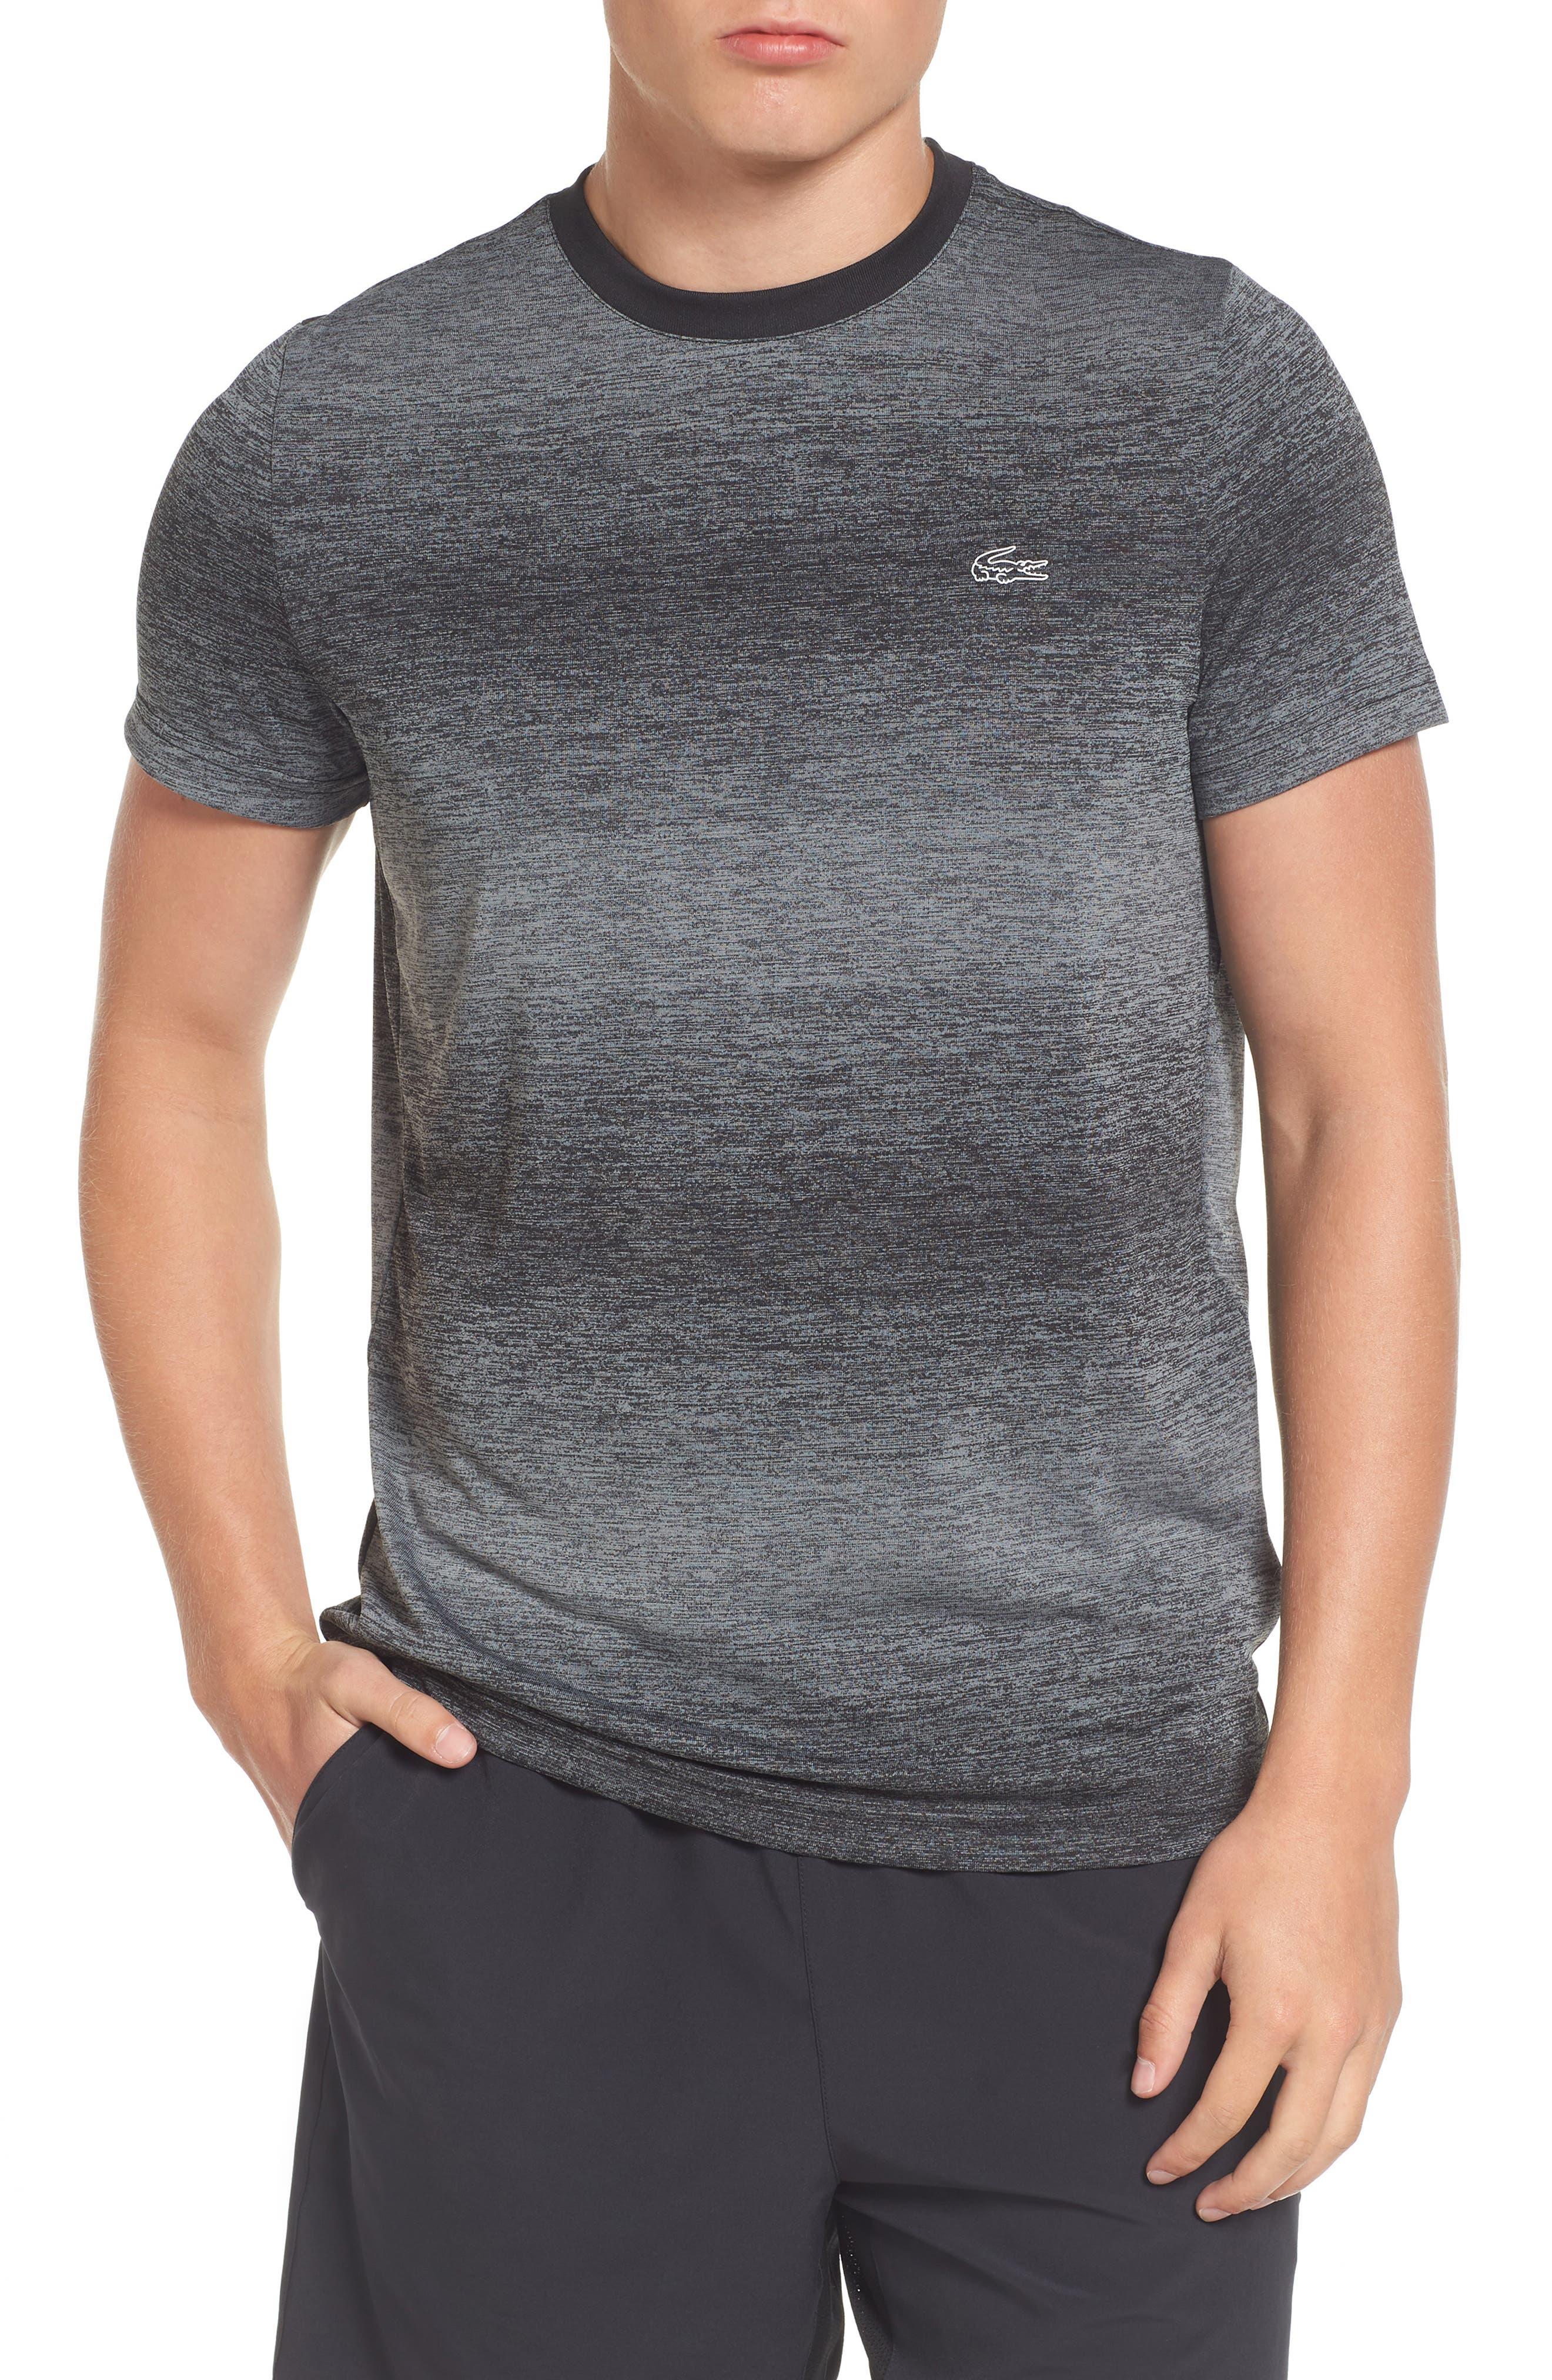 Lacoste Ultra Dry Tech T-Shirt